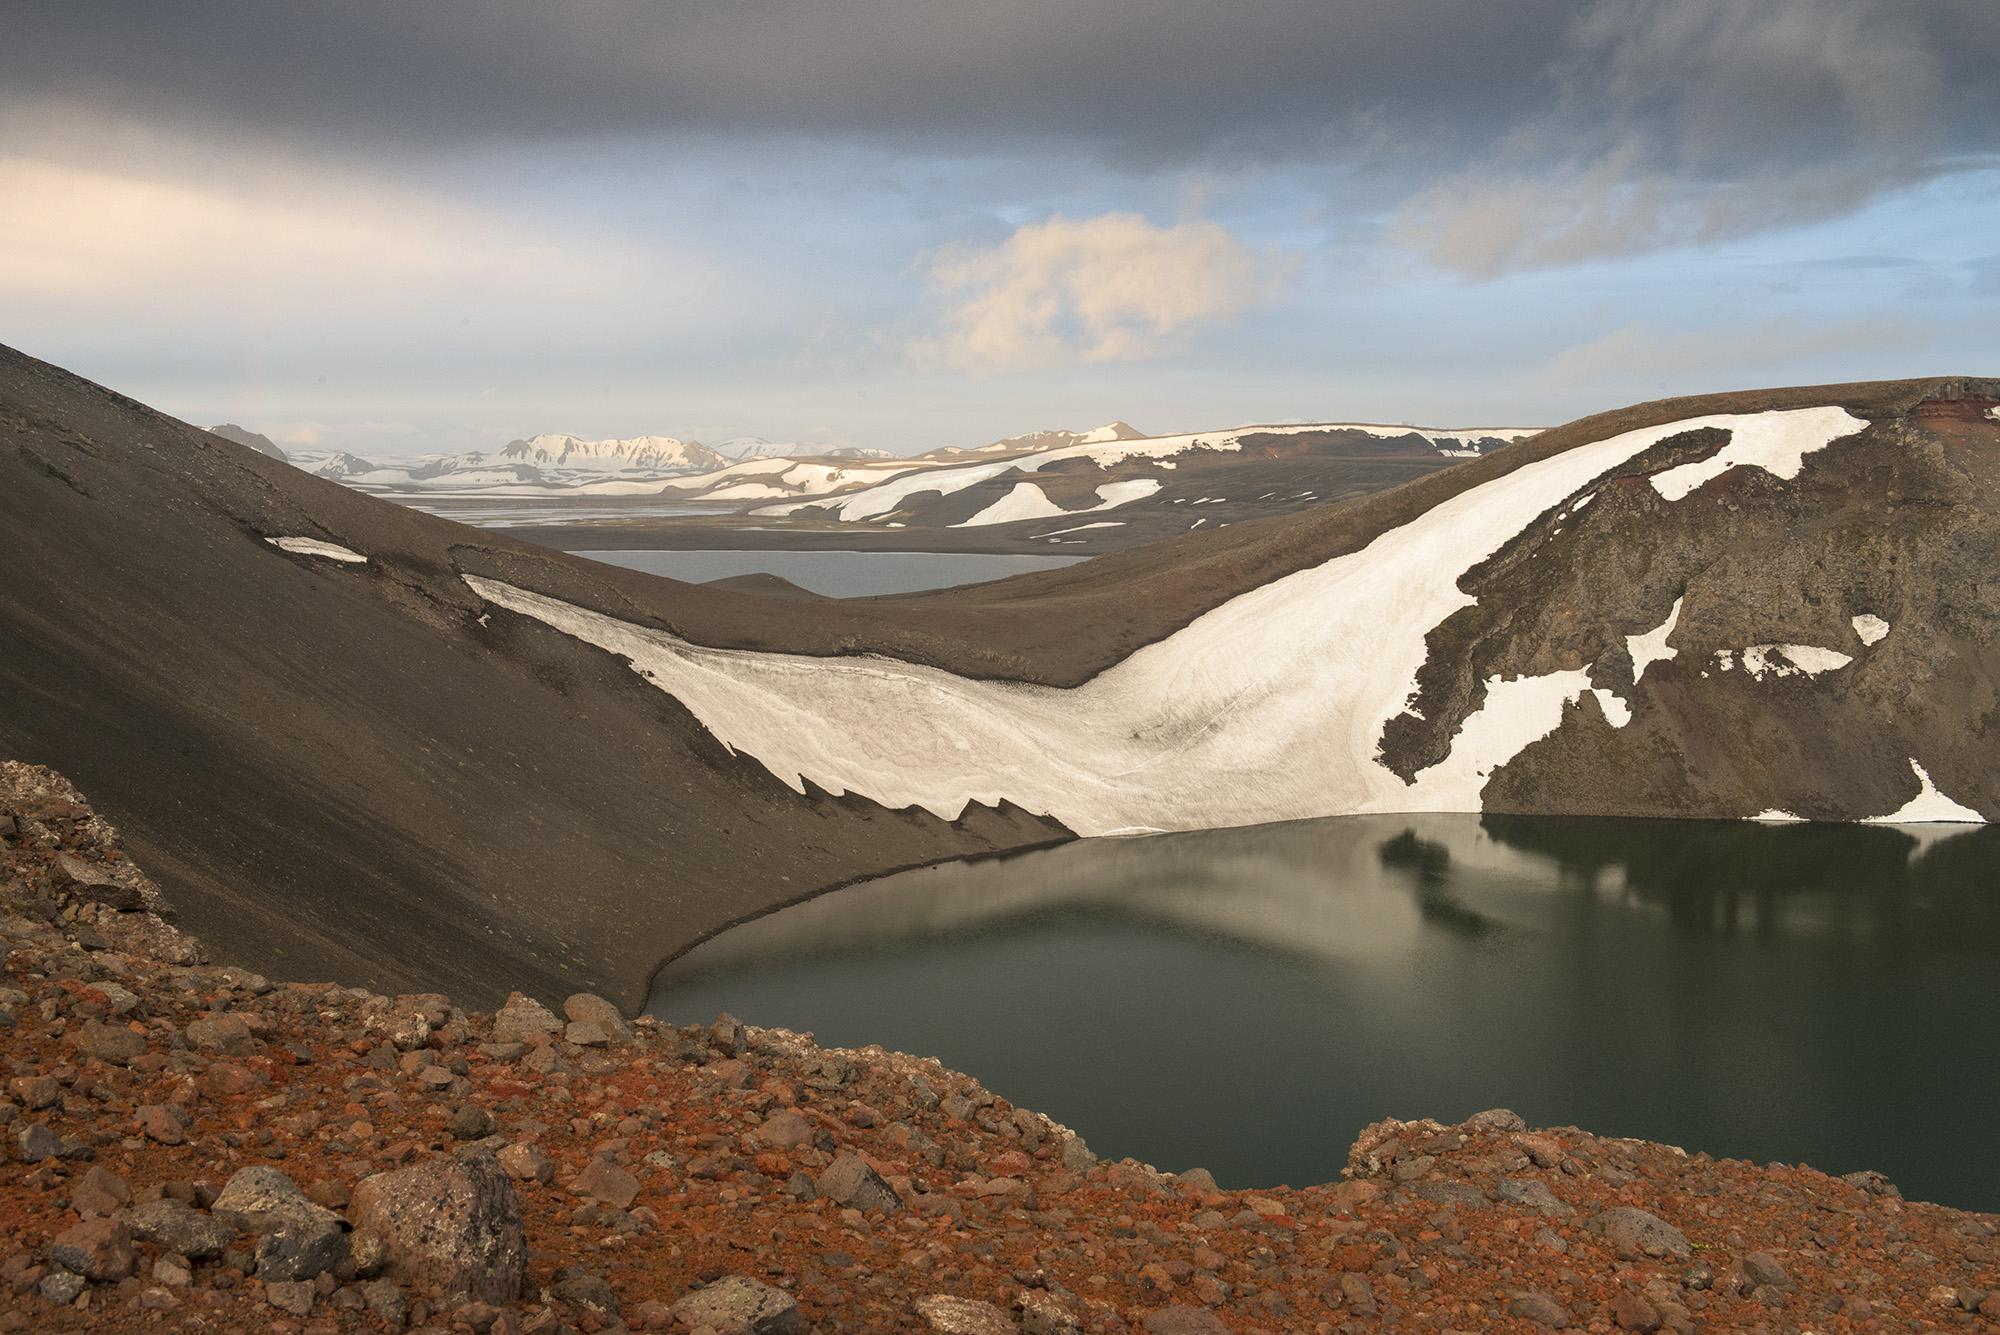 Hnausapollur (Bláhylur), Iceland